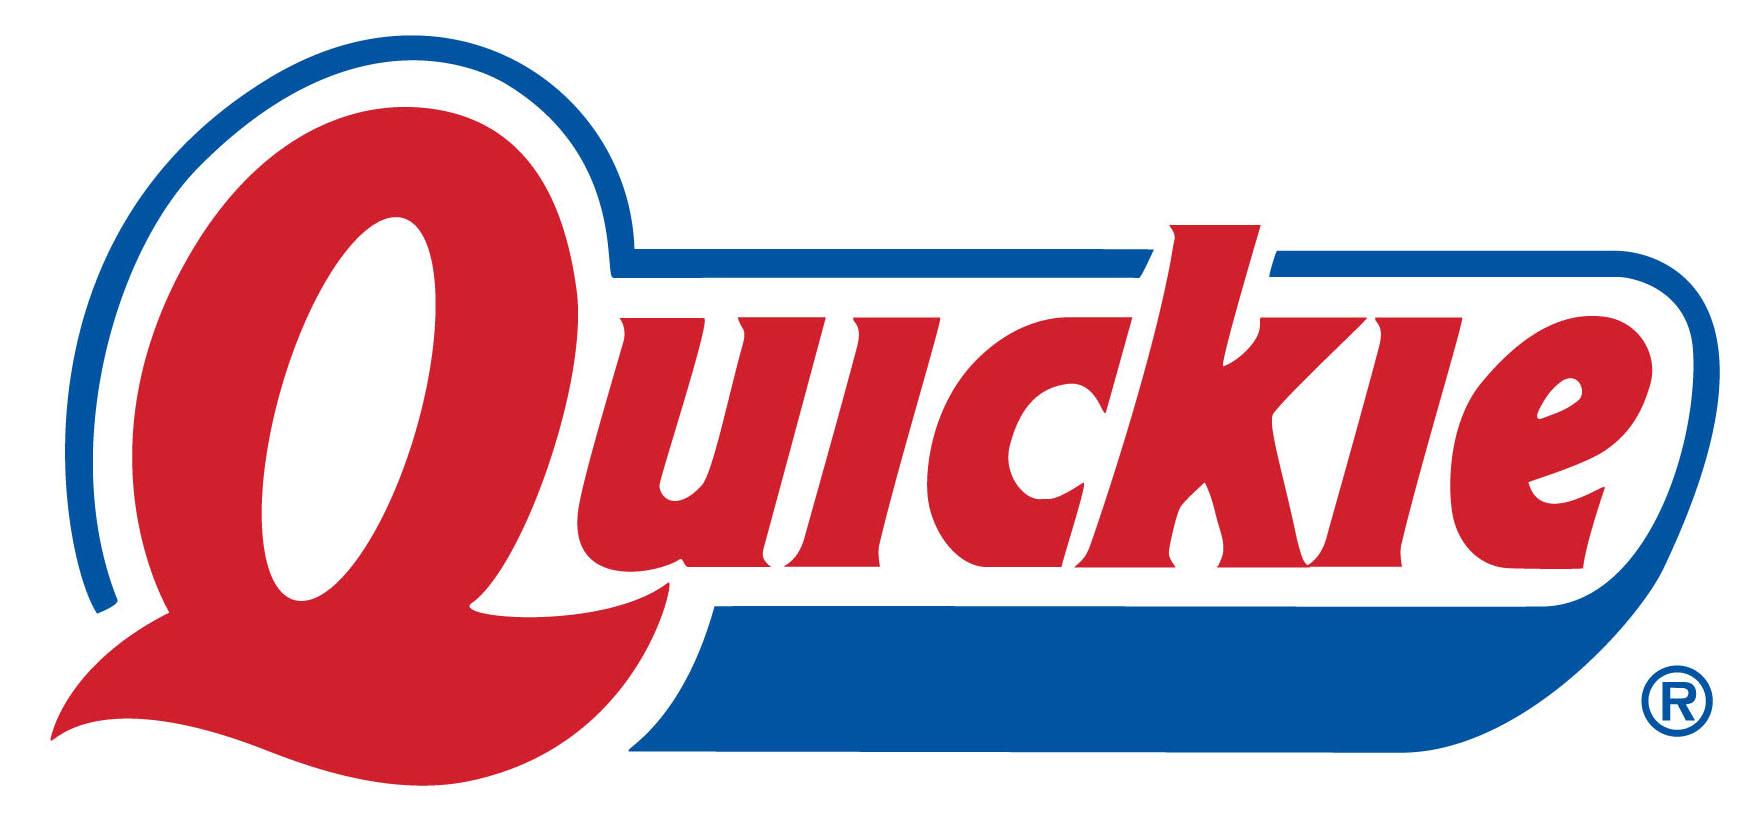 mbns18_Quickie Logo Microban Partner